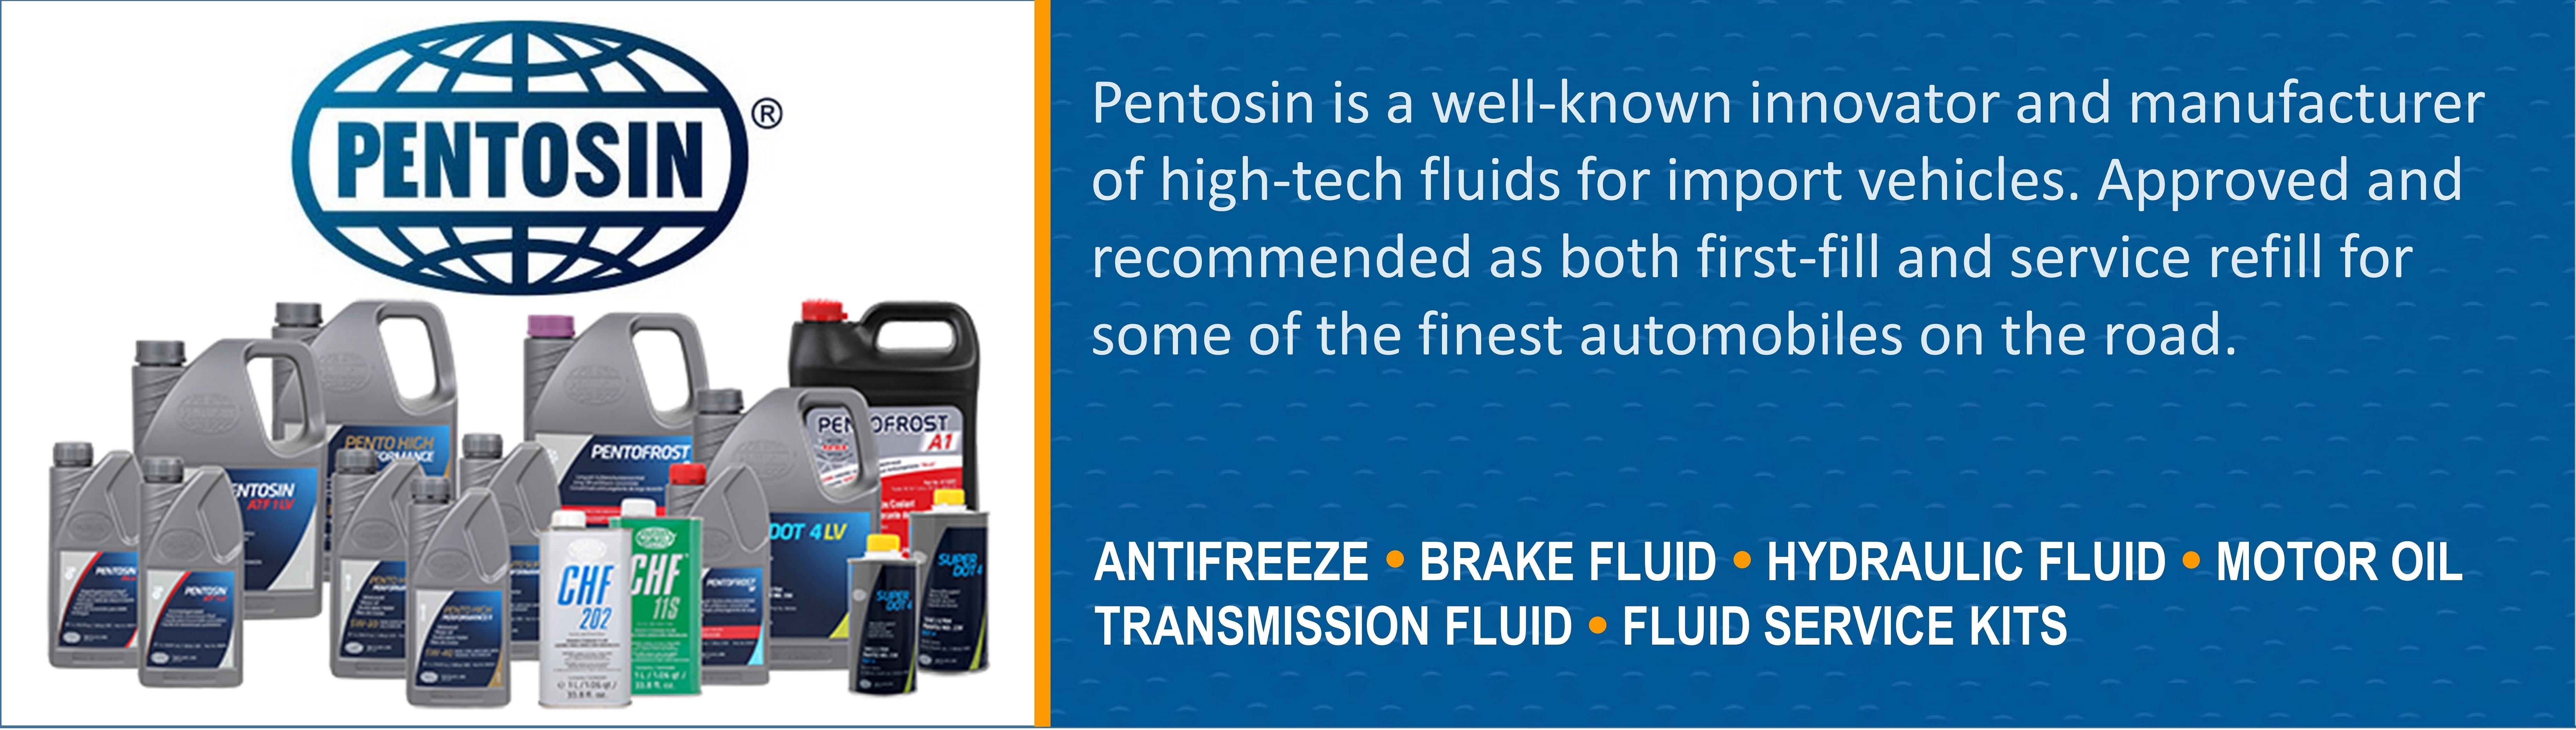 Pentosin 1088107 ATF 1LV Transmission Fluid, 1L